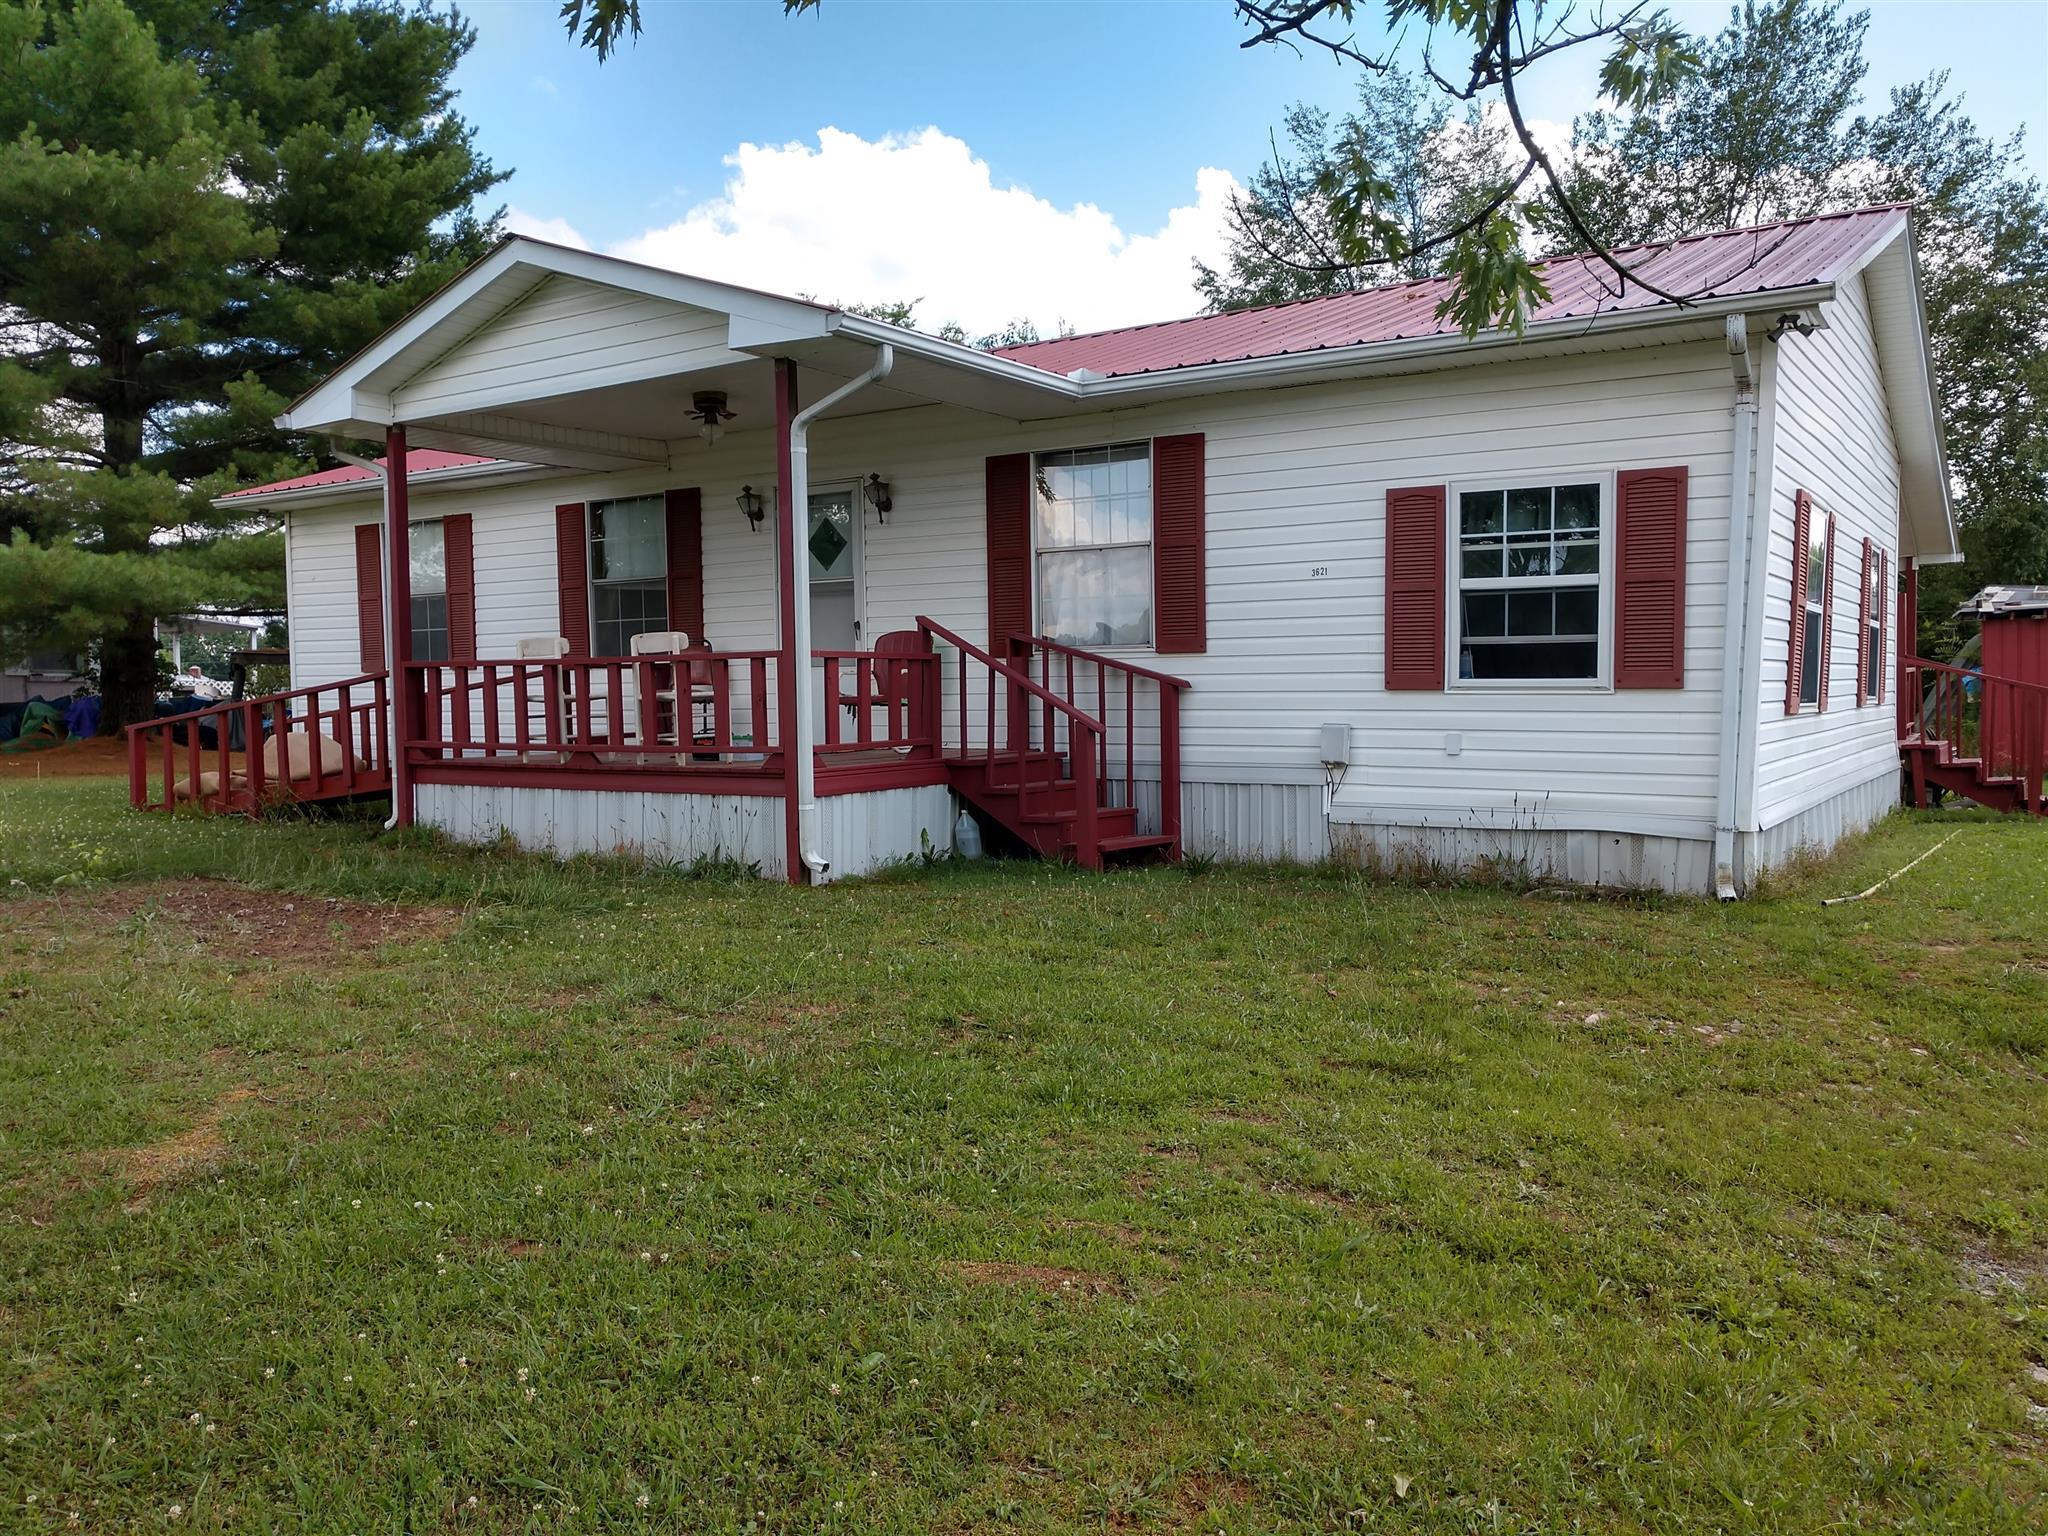 3621 hwy 70, Smithville, TN 37166 - Smithville, TN real estate listing